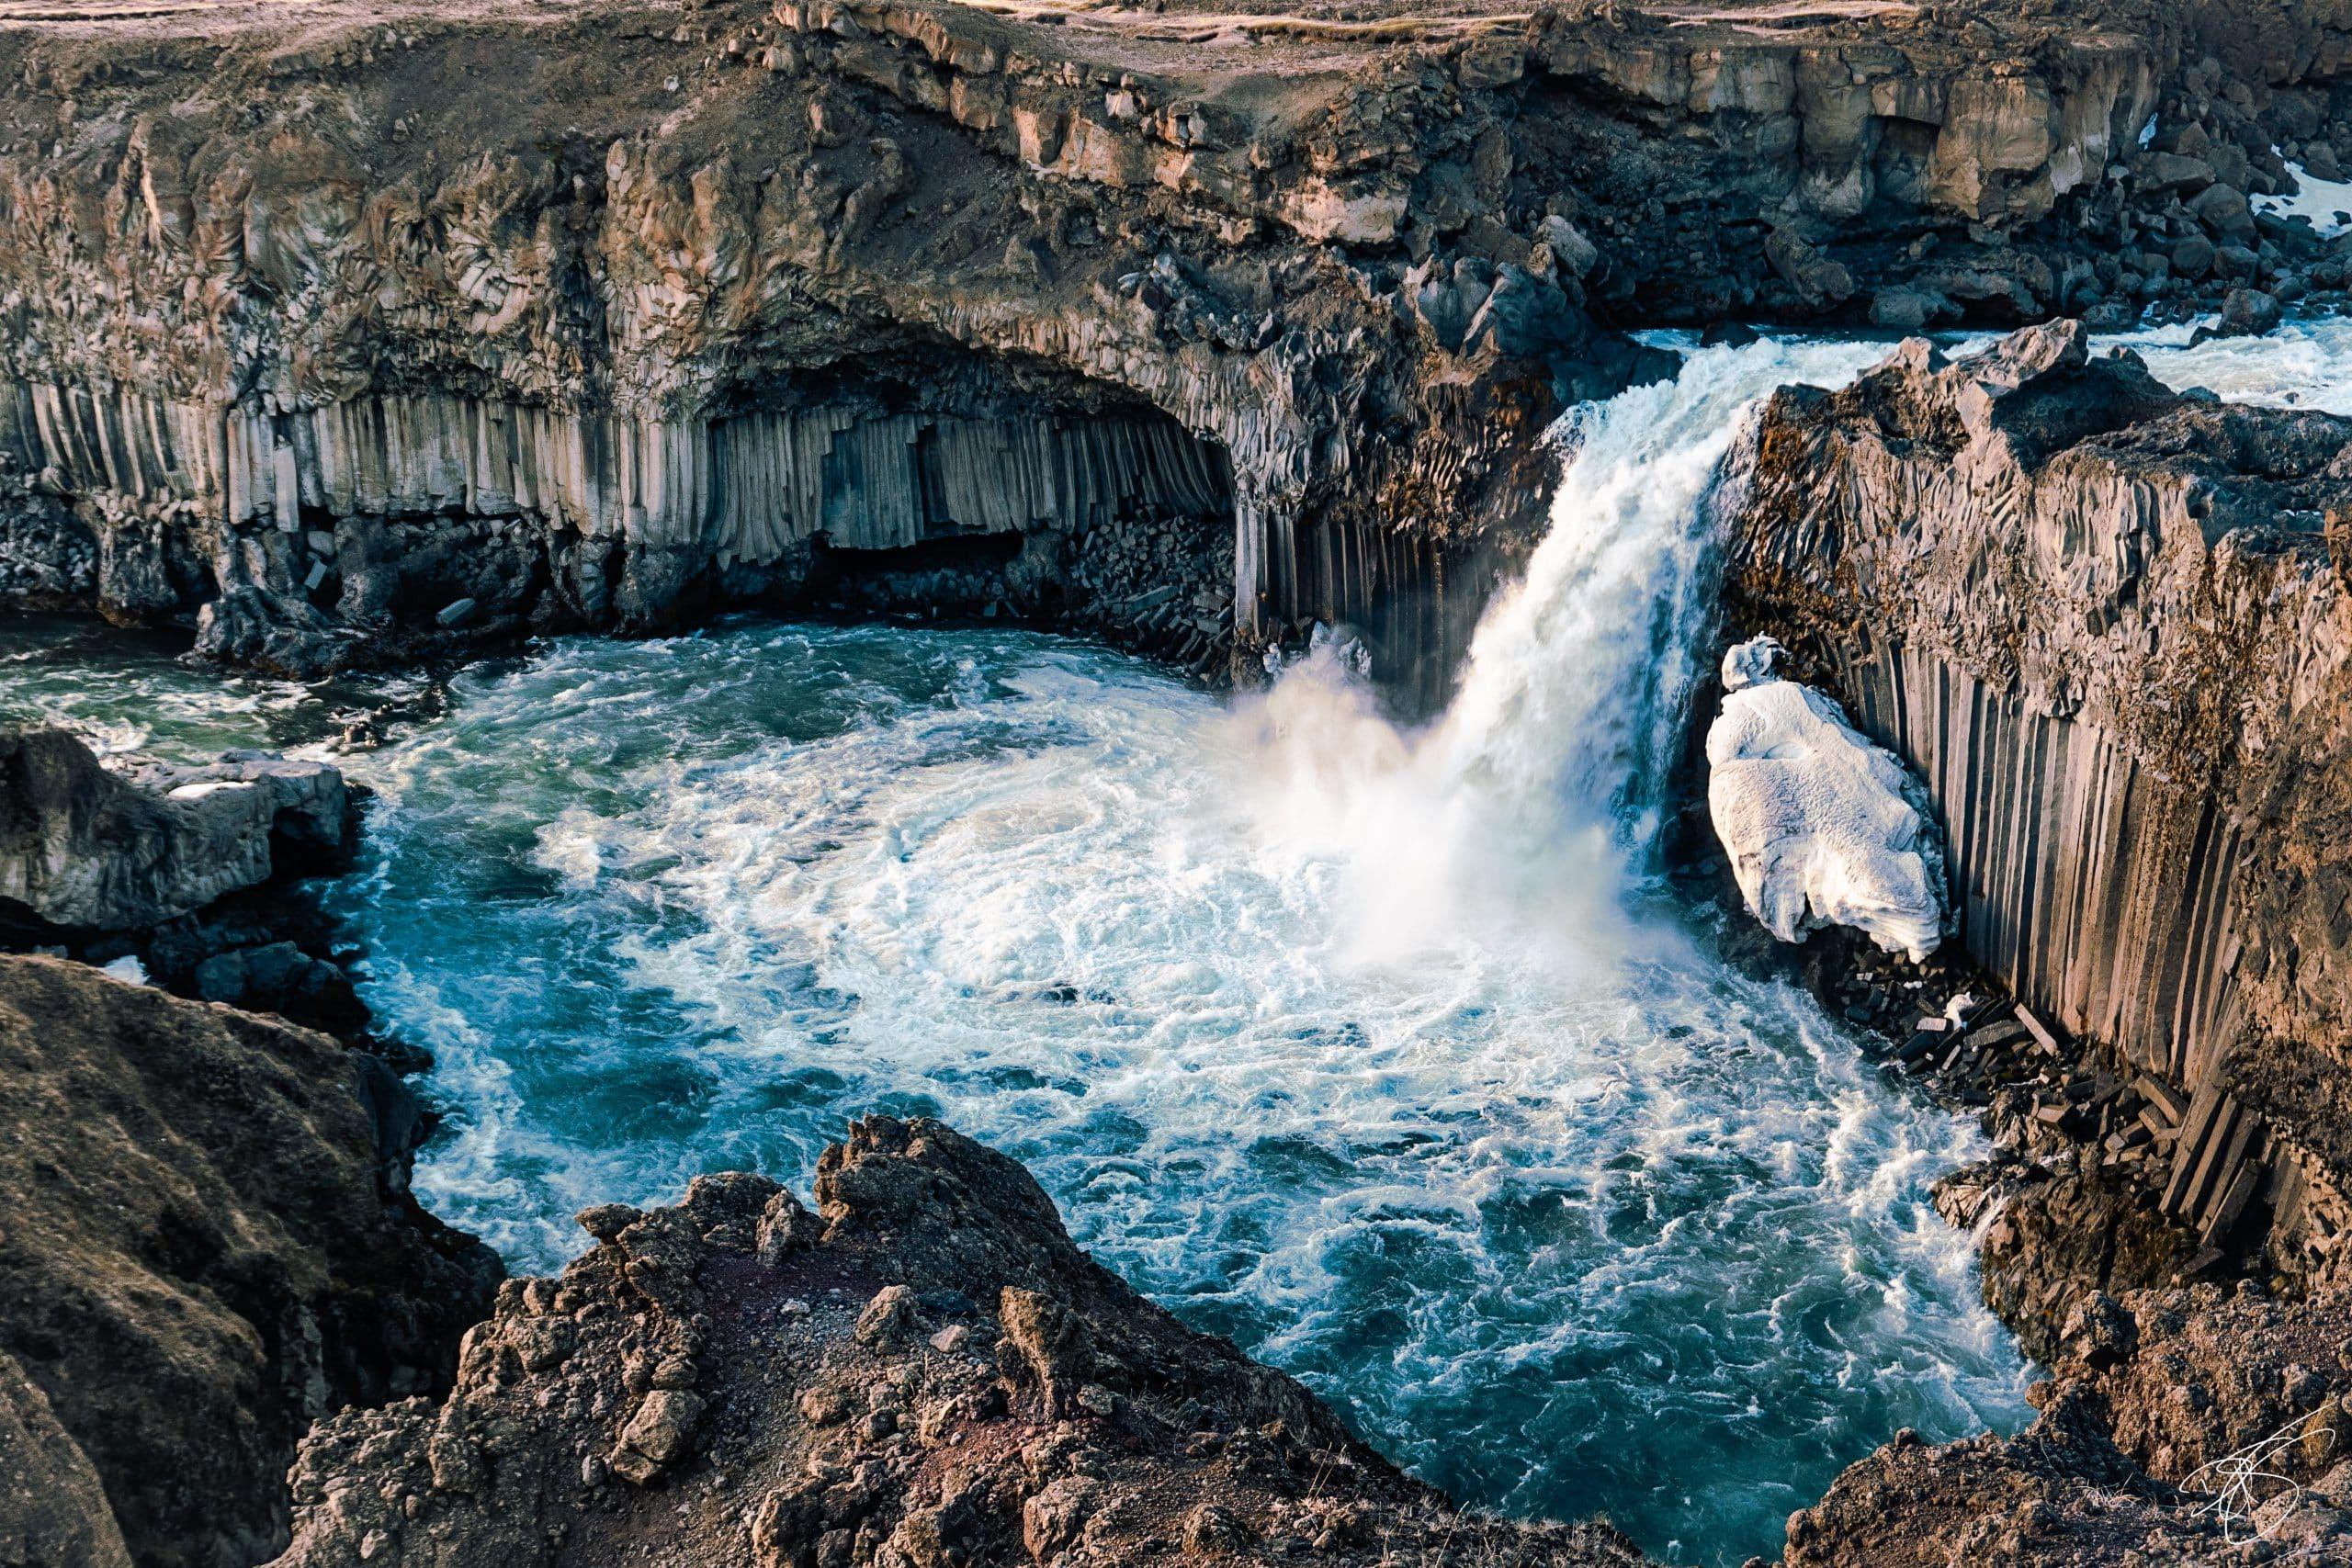 Aldeyjarfoss, a beautiful blue waterfall in the Icelandic Highlands.